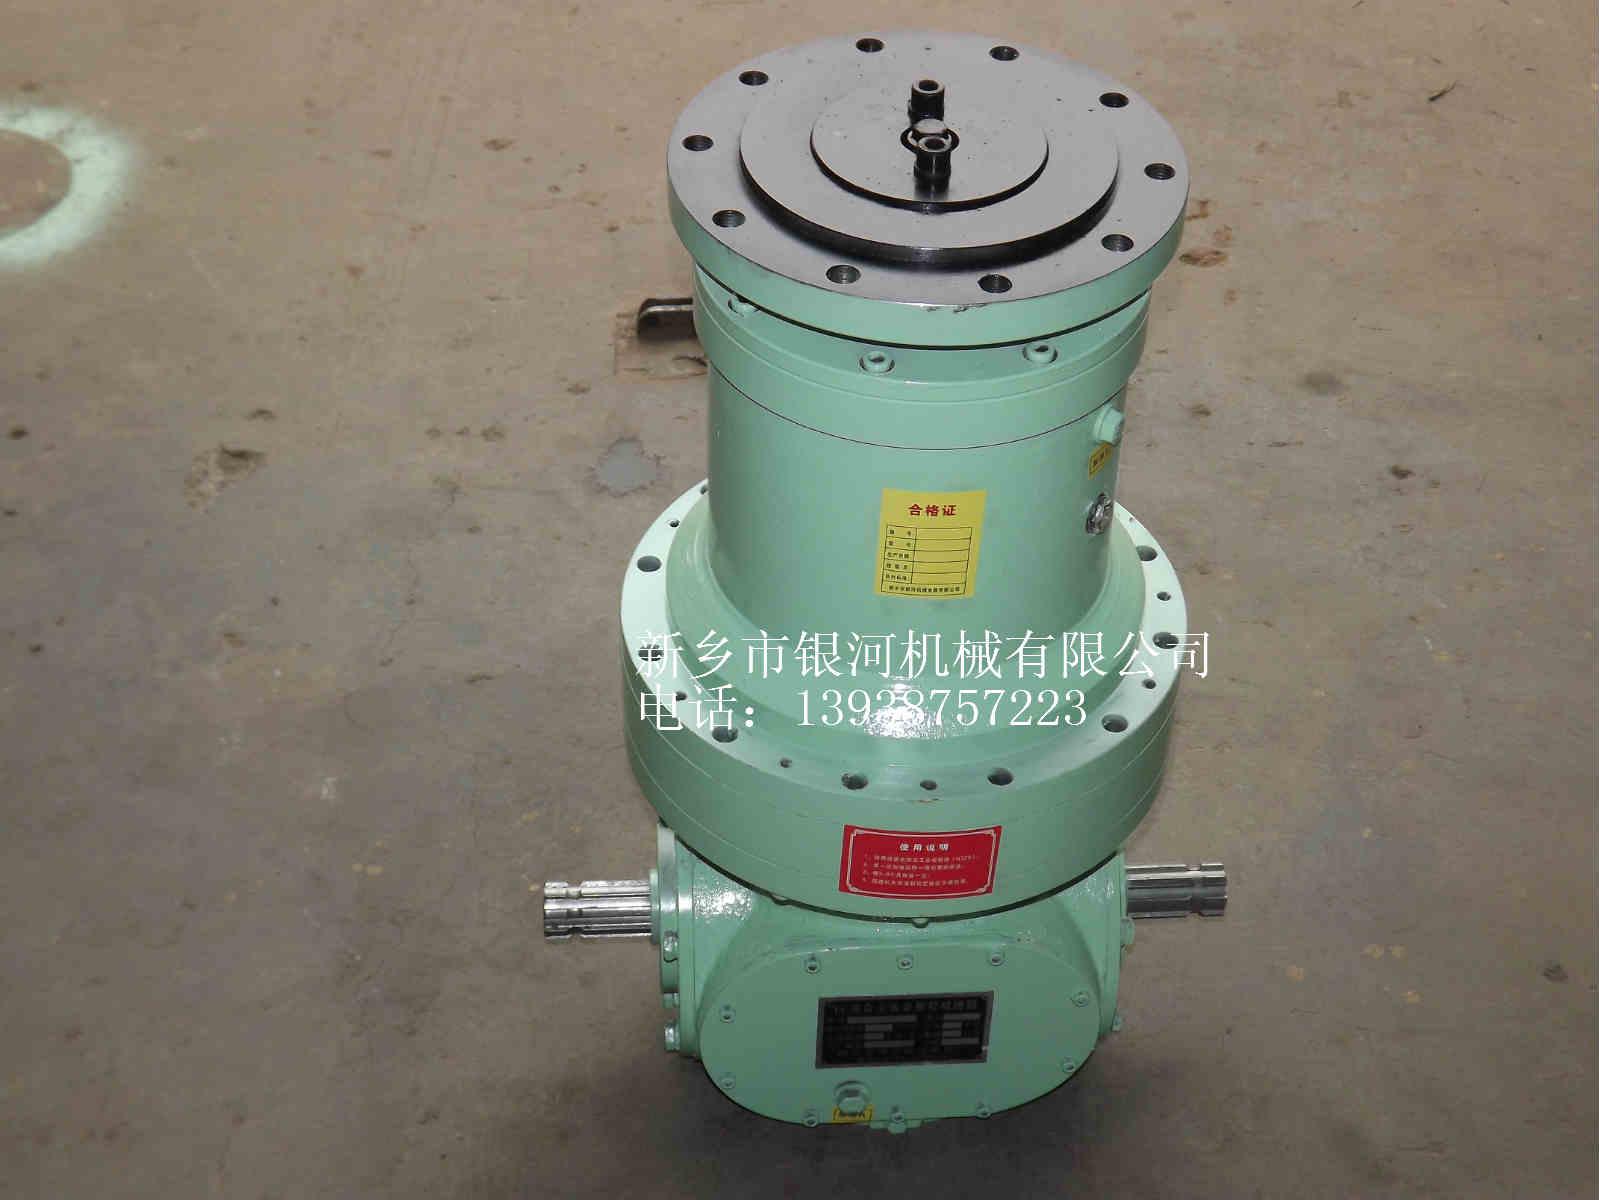 TMR饲料搅拌机专用星轮减速机